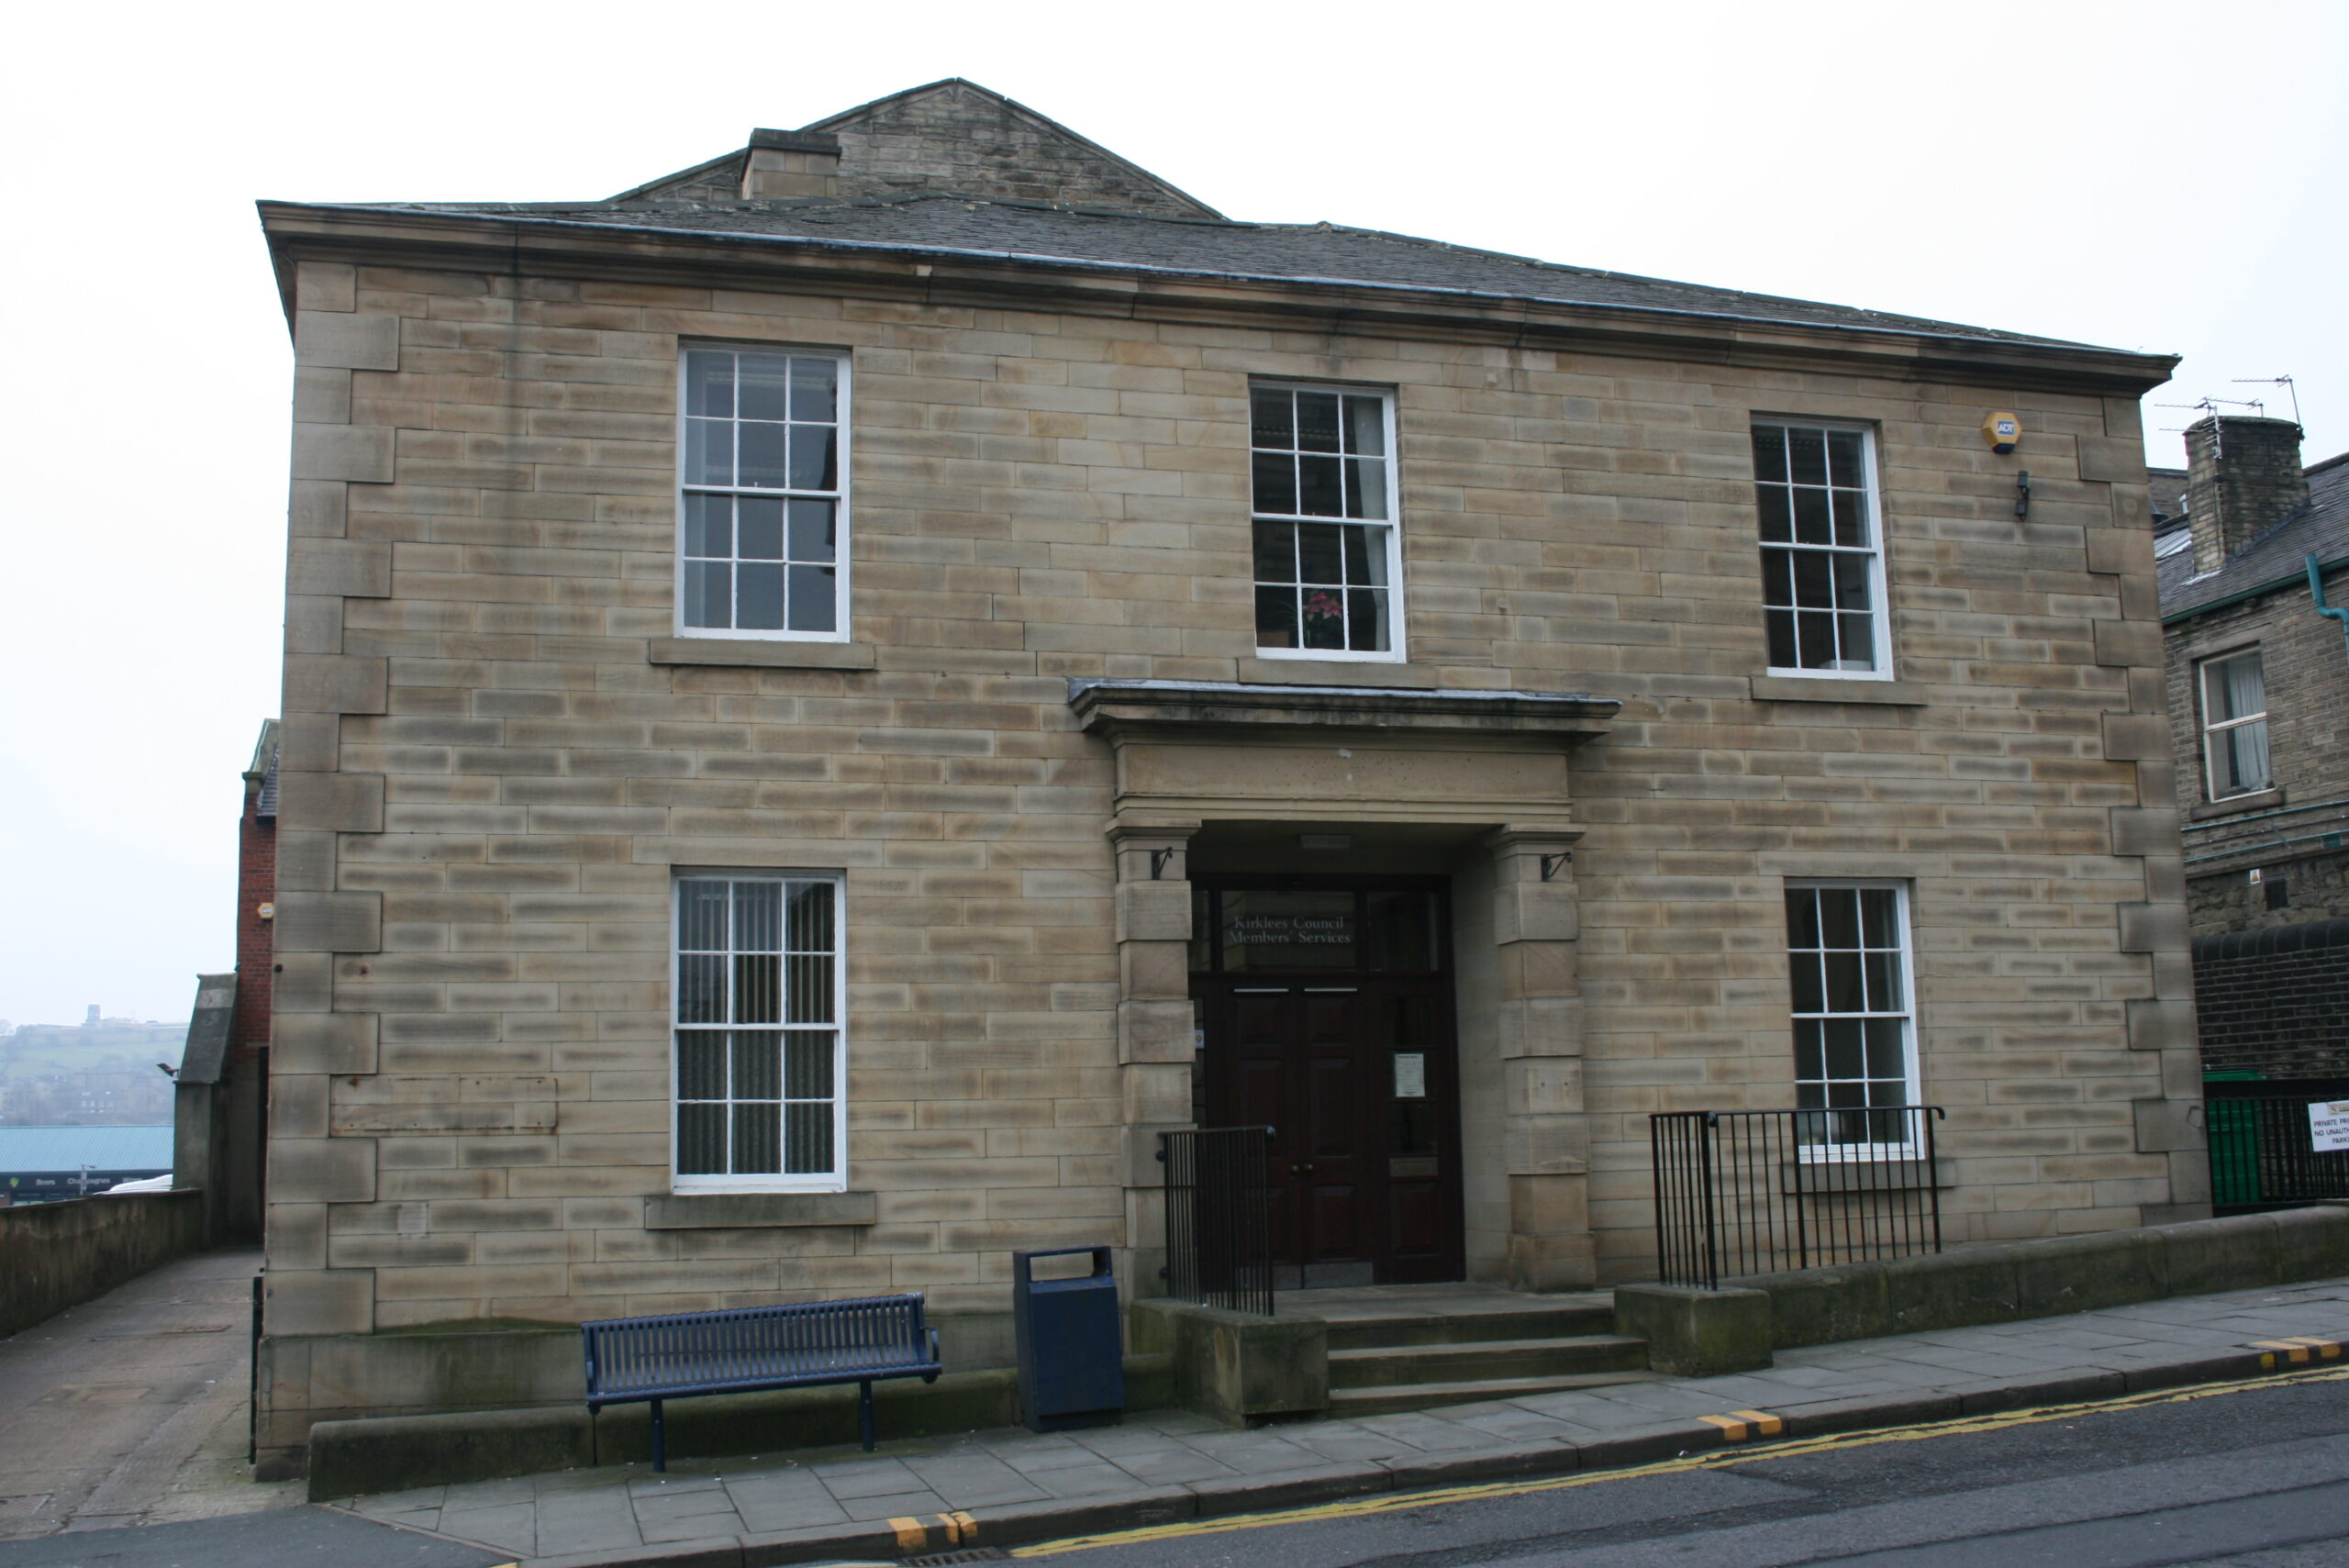 Former County Police Station, Huddersfield